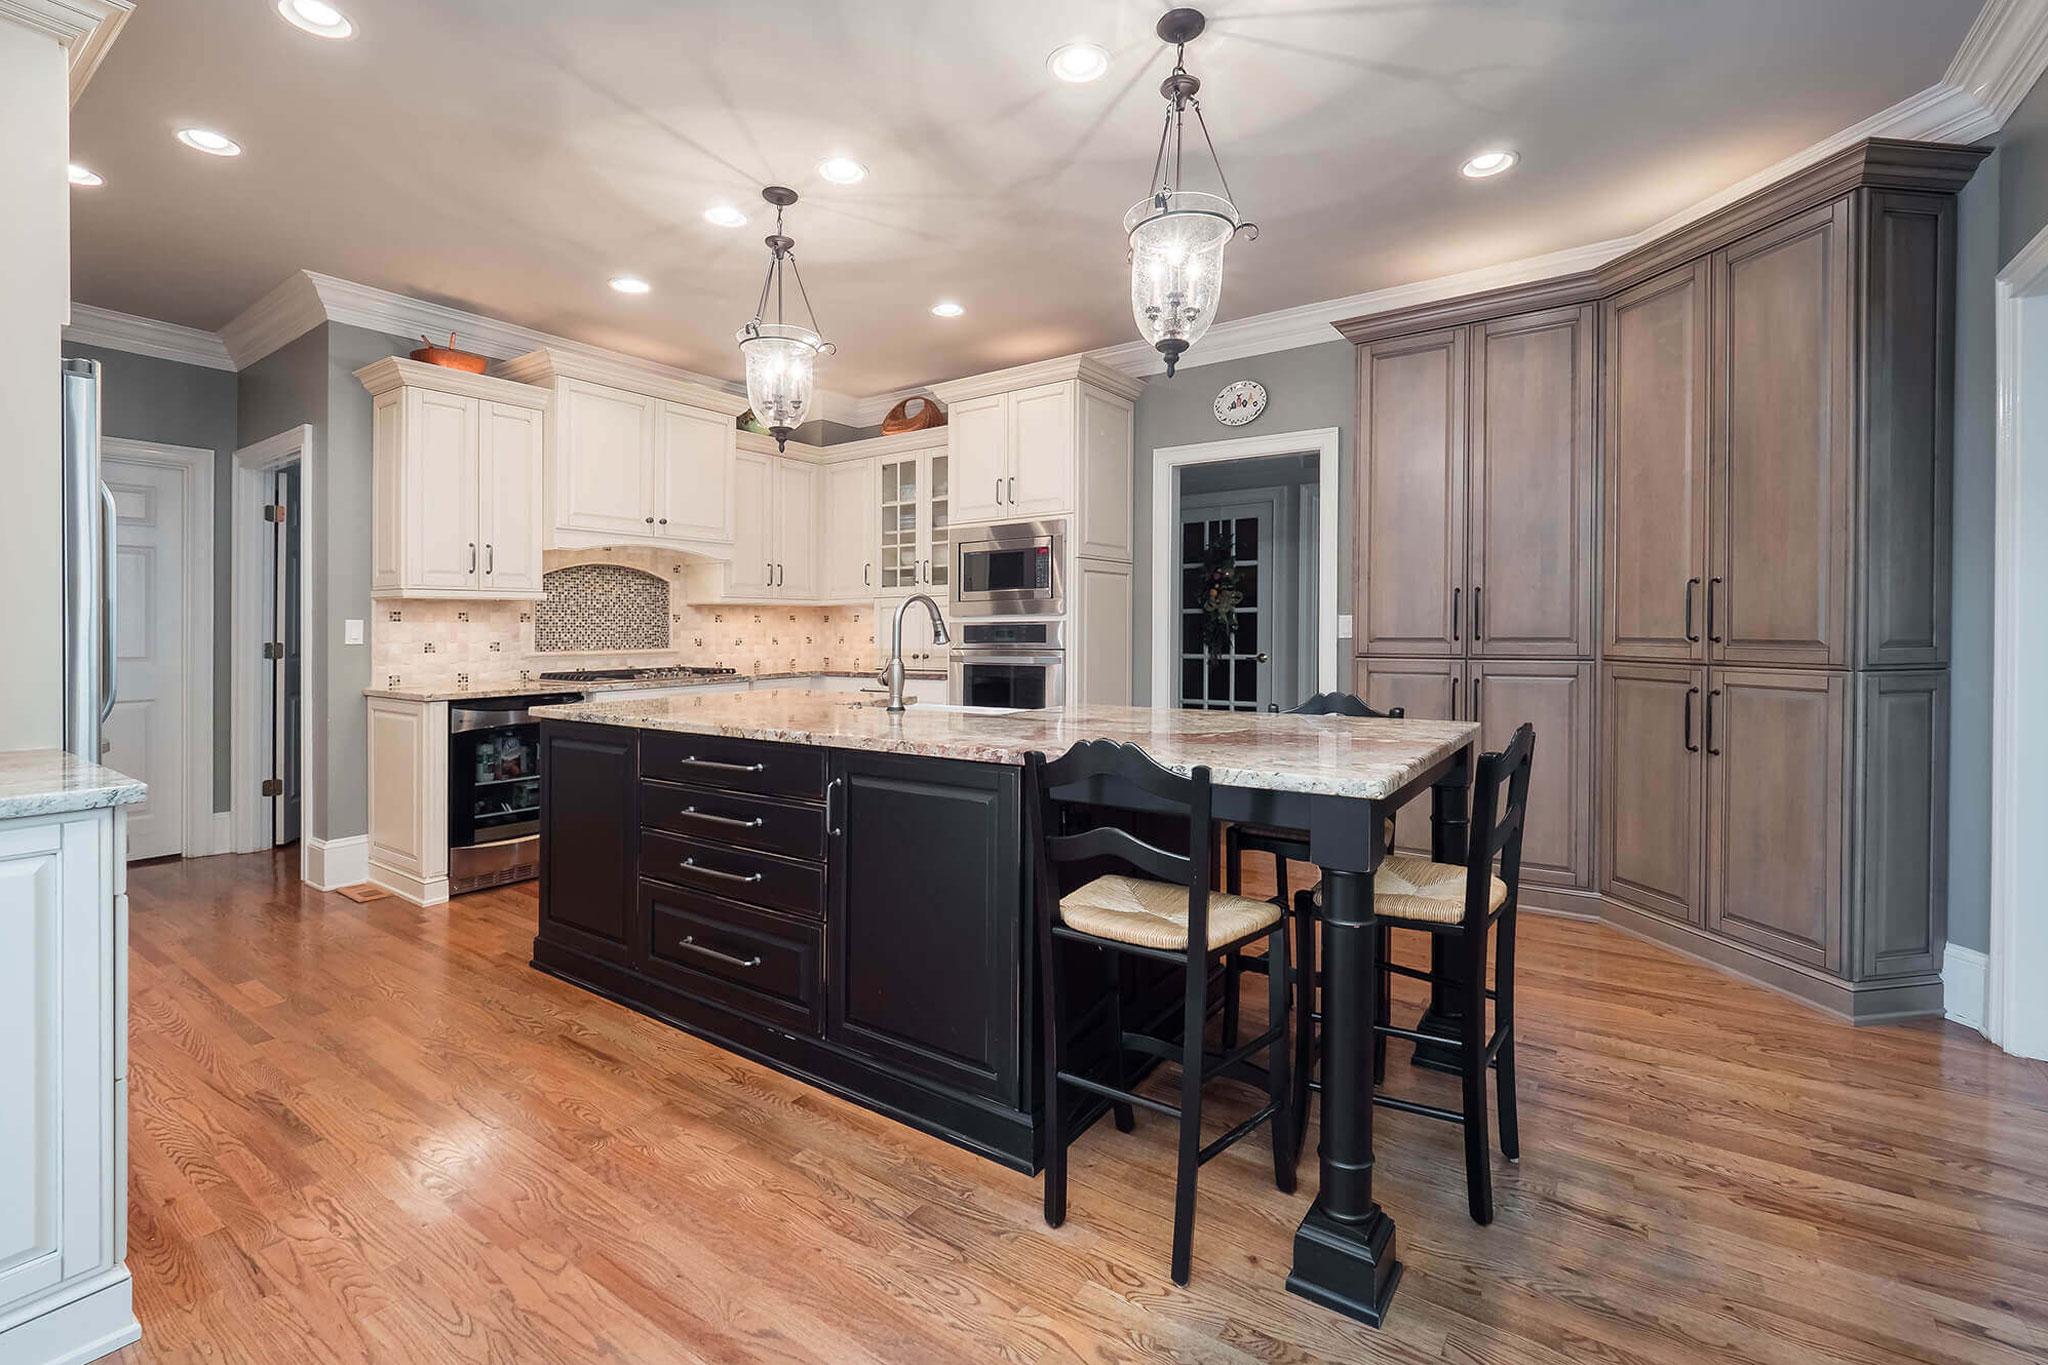 cheryl pett design - custom kitchens & fine cabinetry